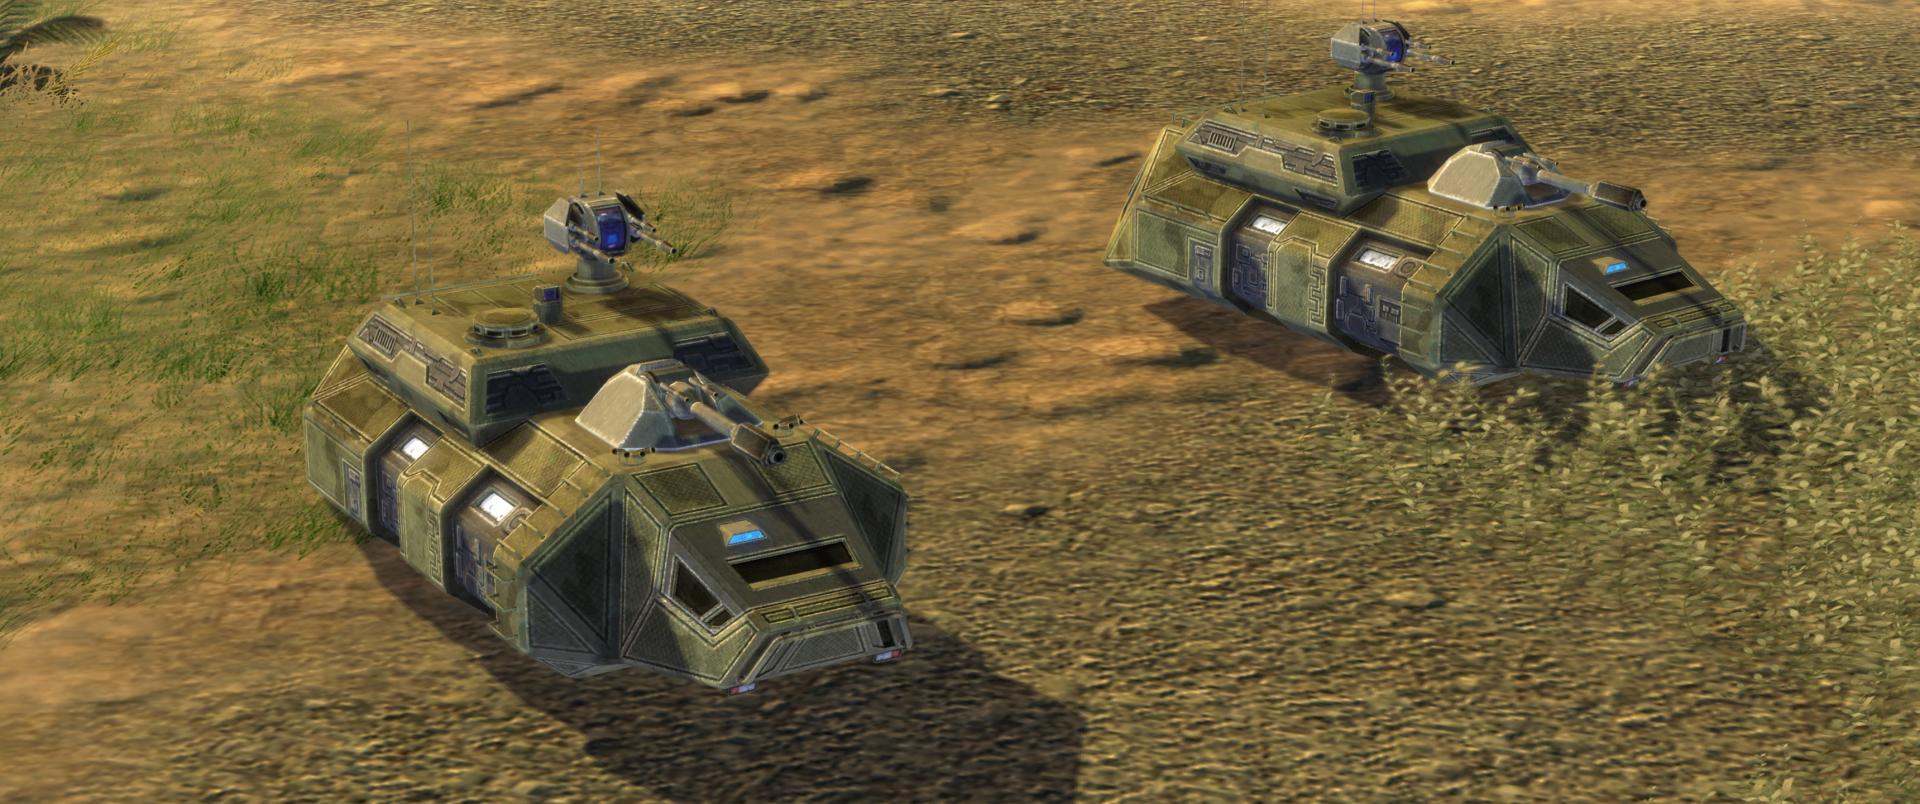 Steam Workshop :: Awakening of the Rebellion 2 7 2